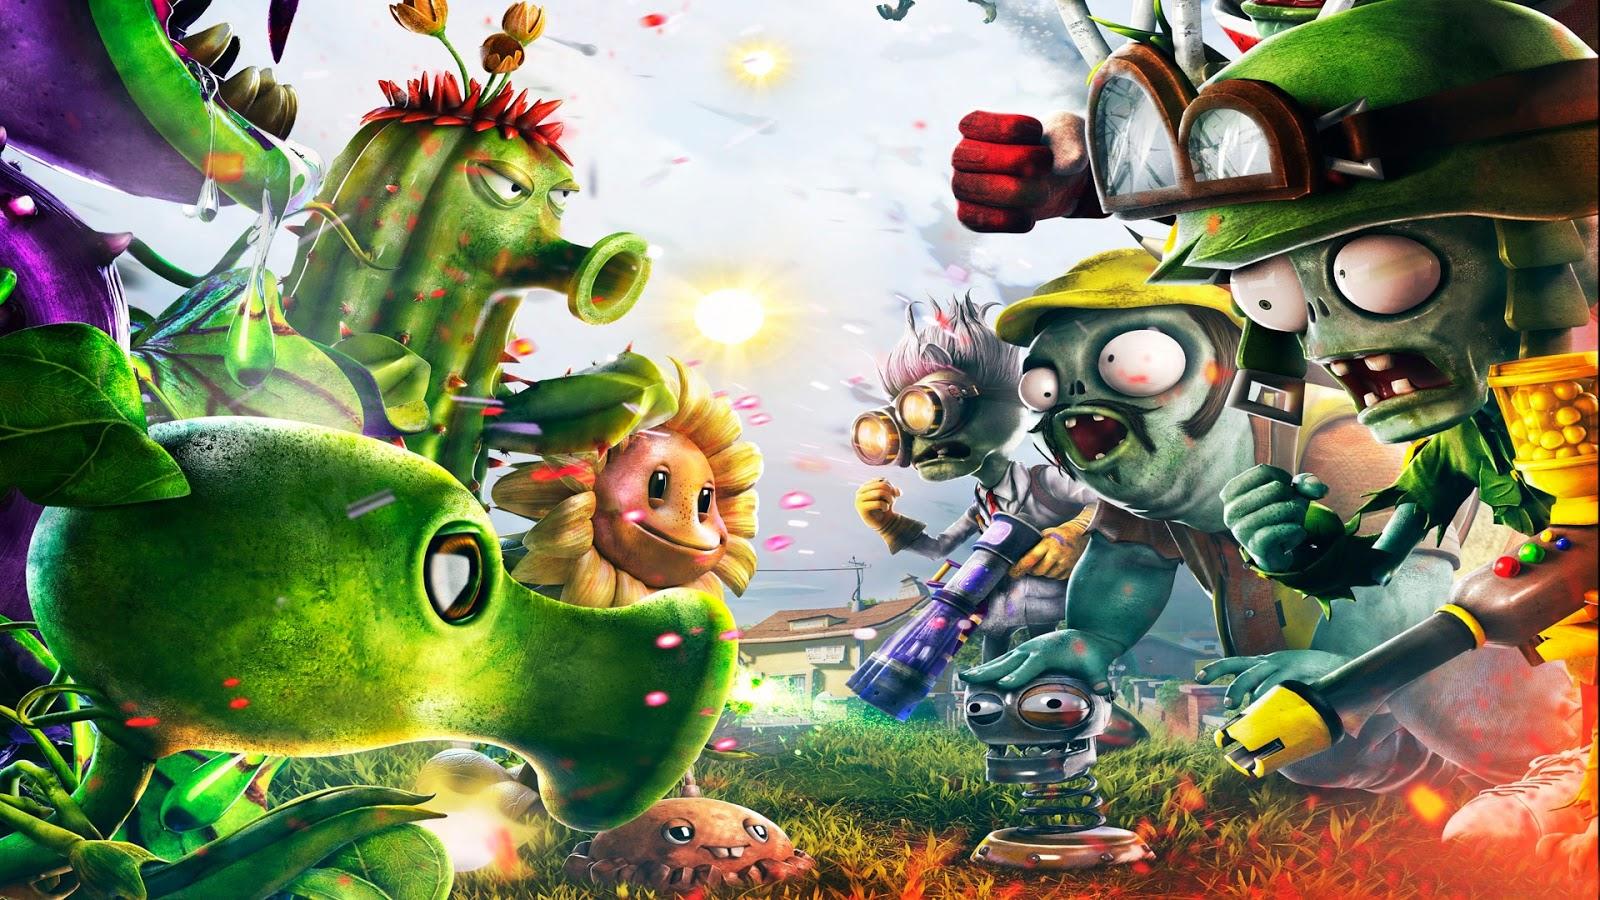 plants vs zombies 2 تحميل لعبة للكمبيوتر